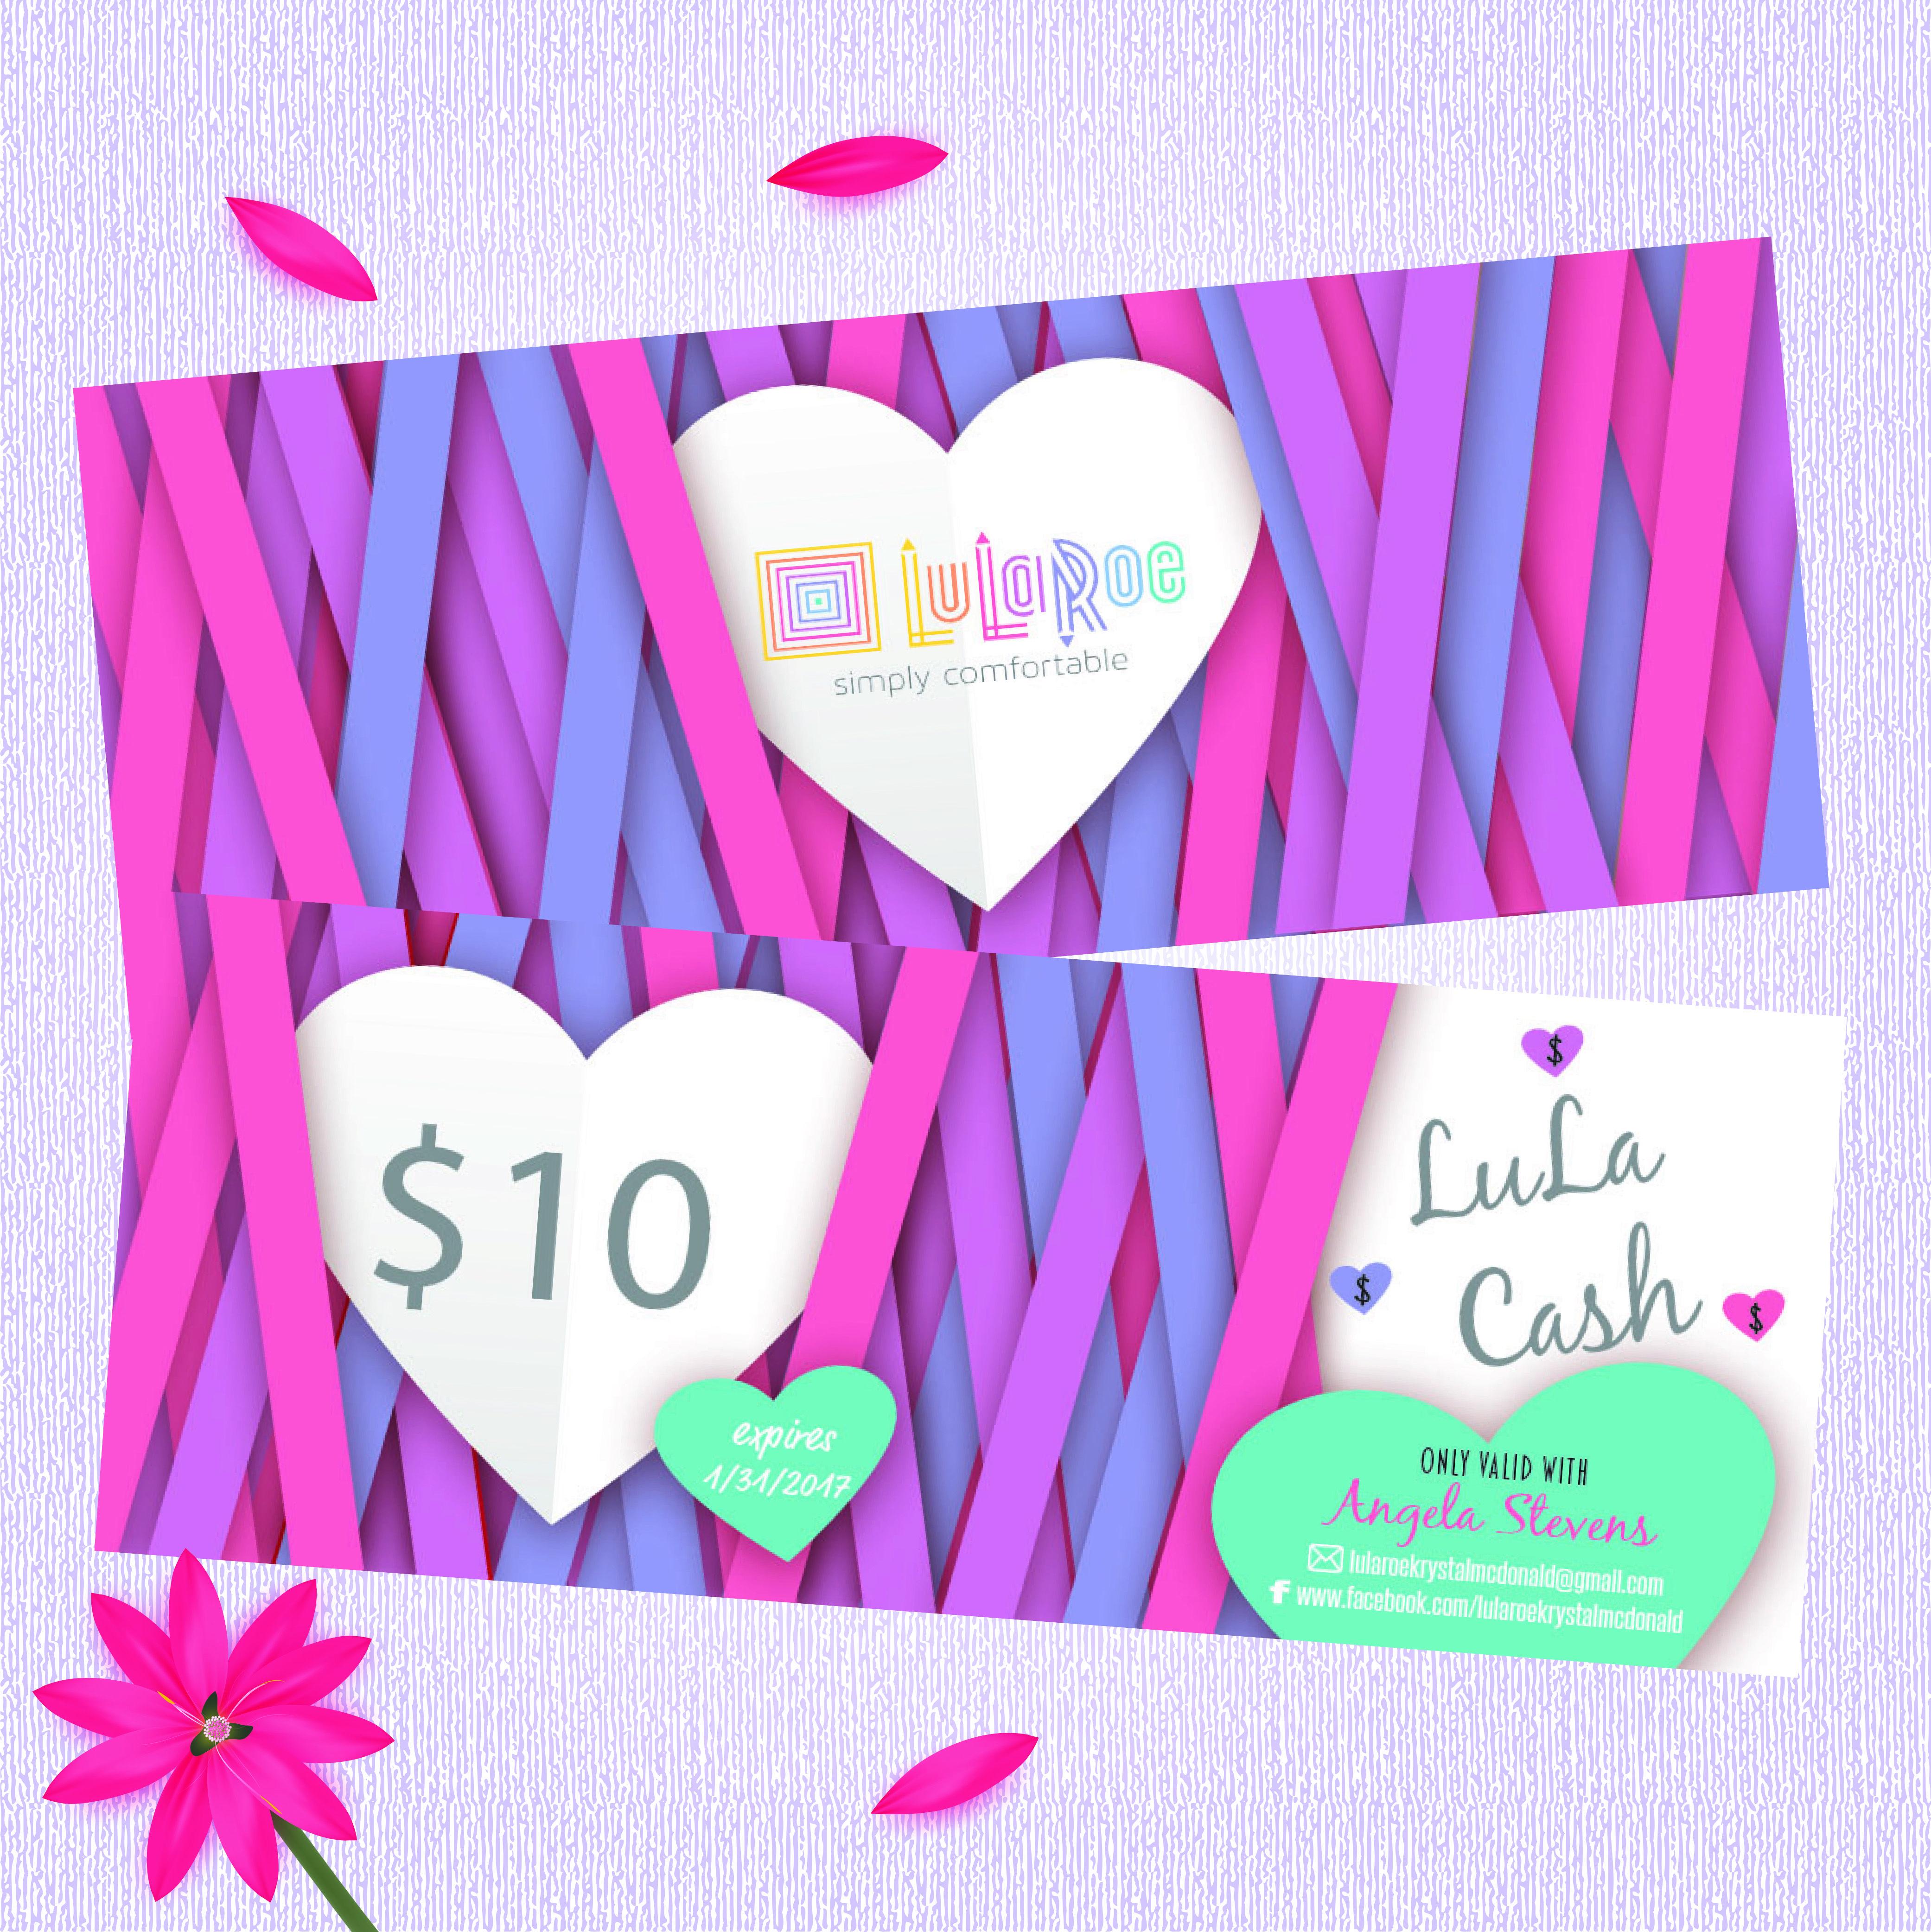 LuLaRoe Cash- Hearts Laced- Valentine's Day